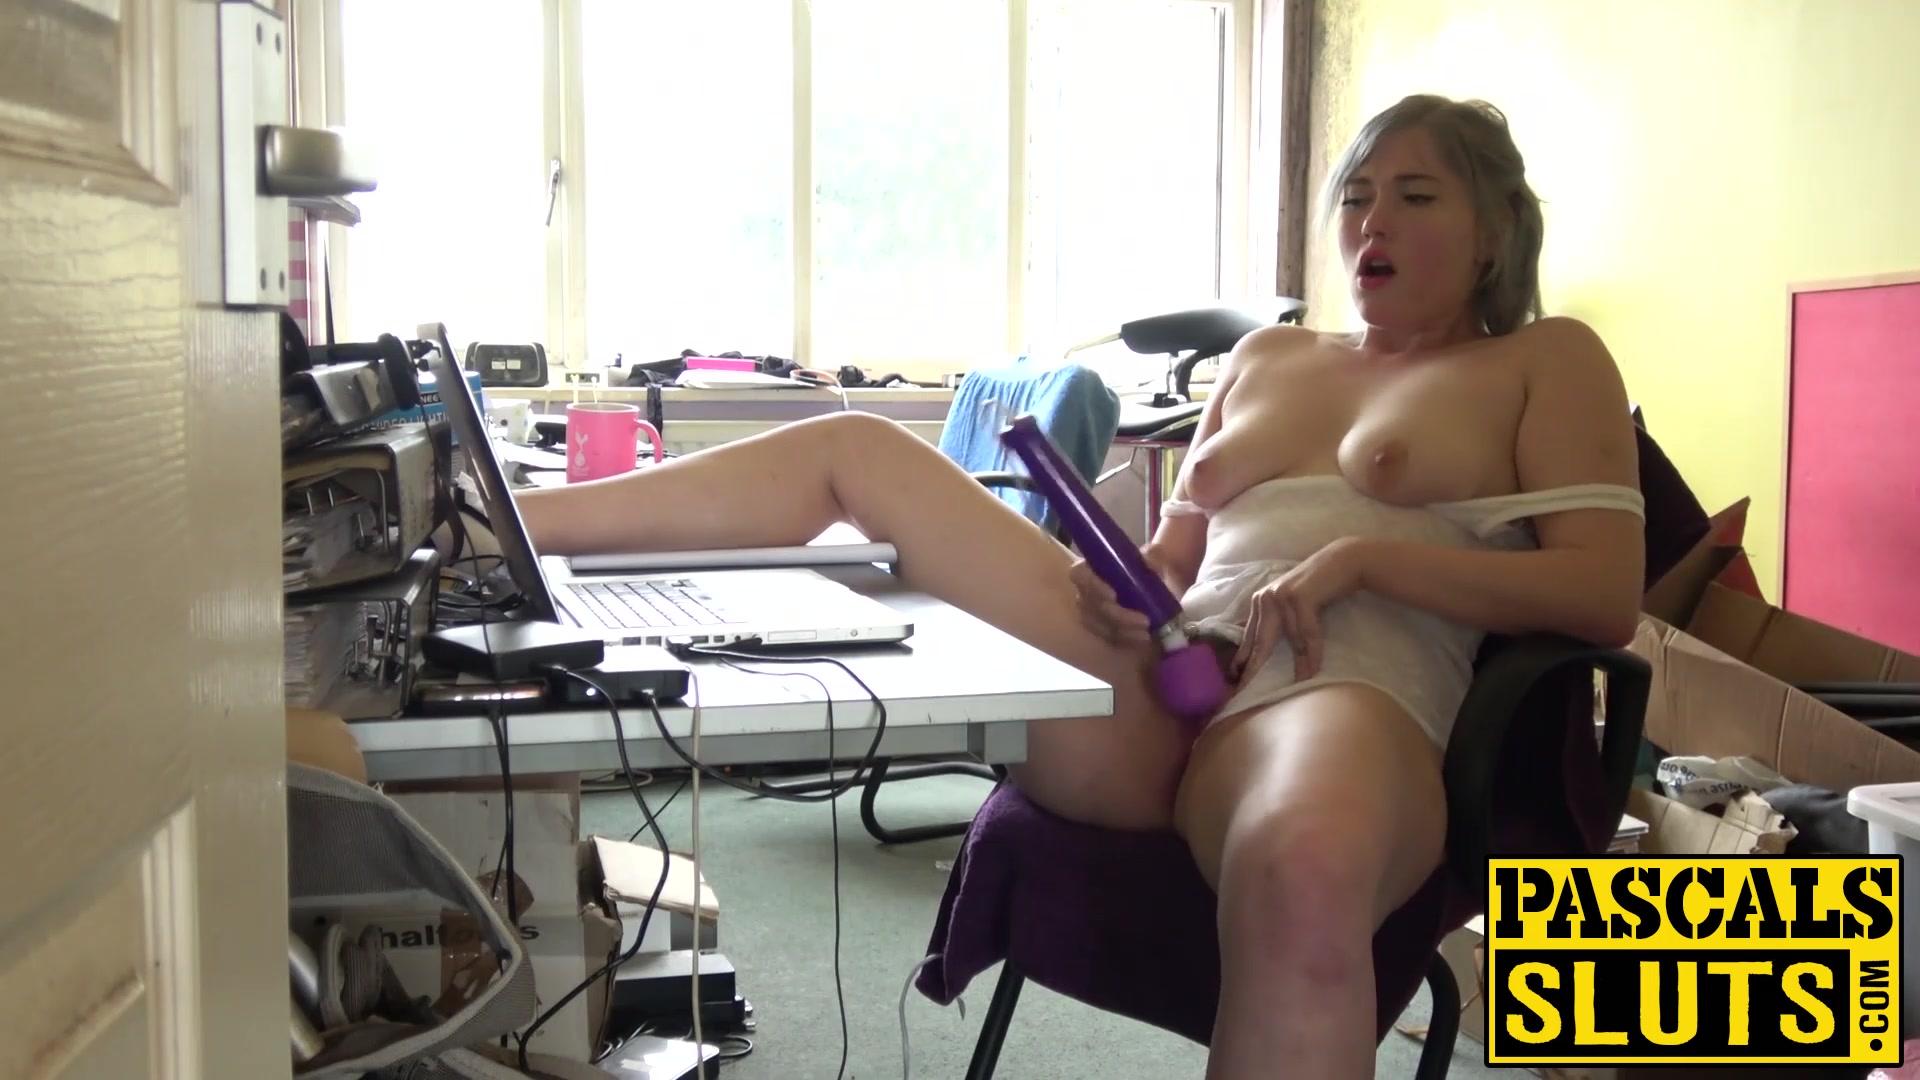 Nude Photo Galleries Sexy talk in spanish